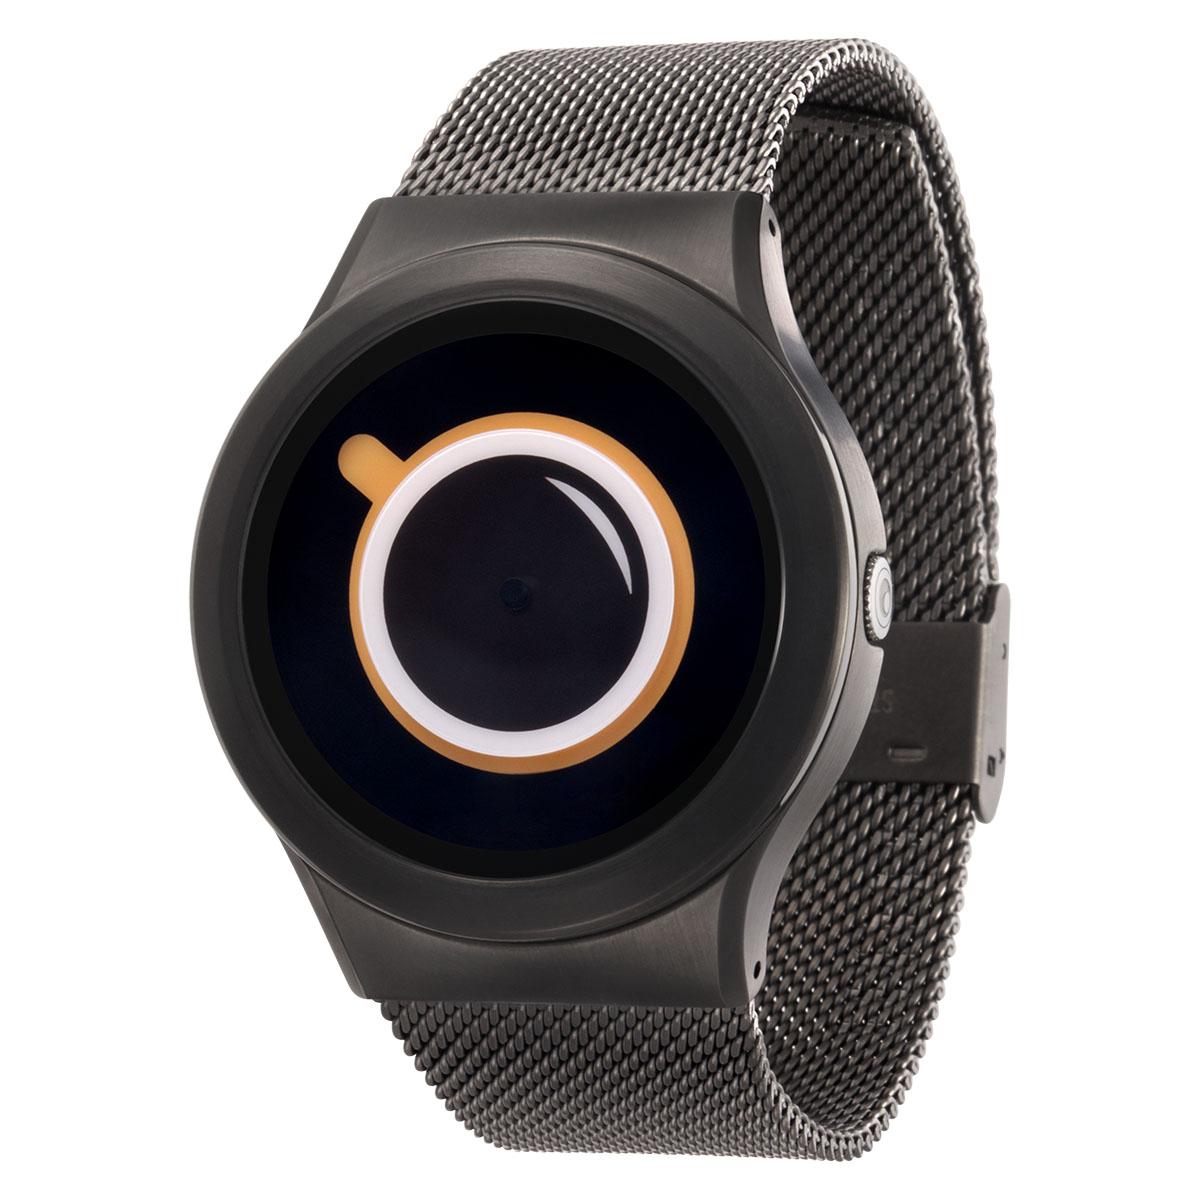 ZEROO COFFEE TIME ゼロ 電池式クォーツ 腕時計 [W03009B02SM02] ベージュ デザインウォッチ ペア用 メンズ レディース ユニセックス おしゃれ時計 デザイナーズ